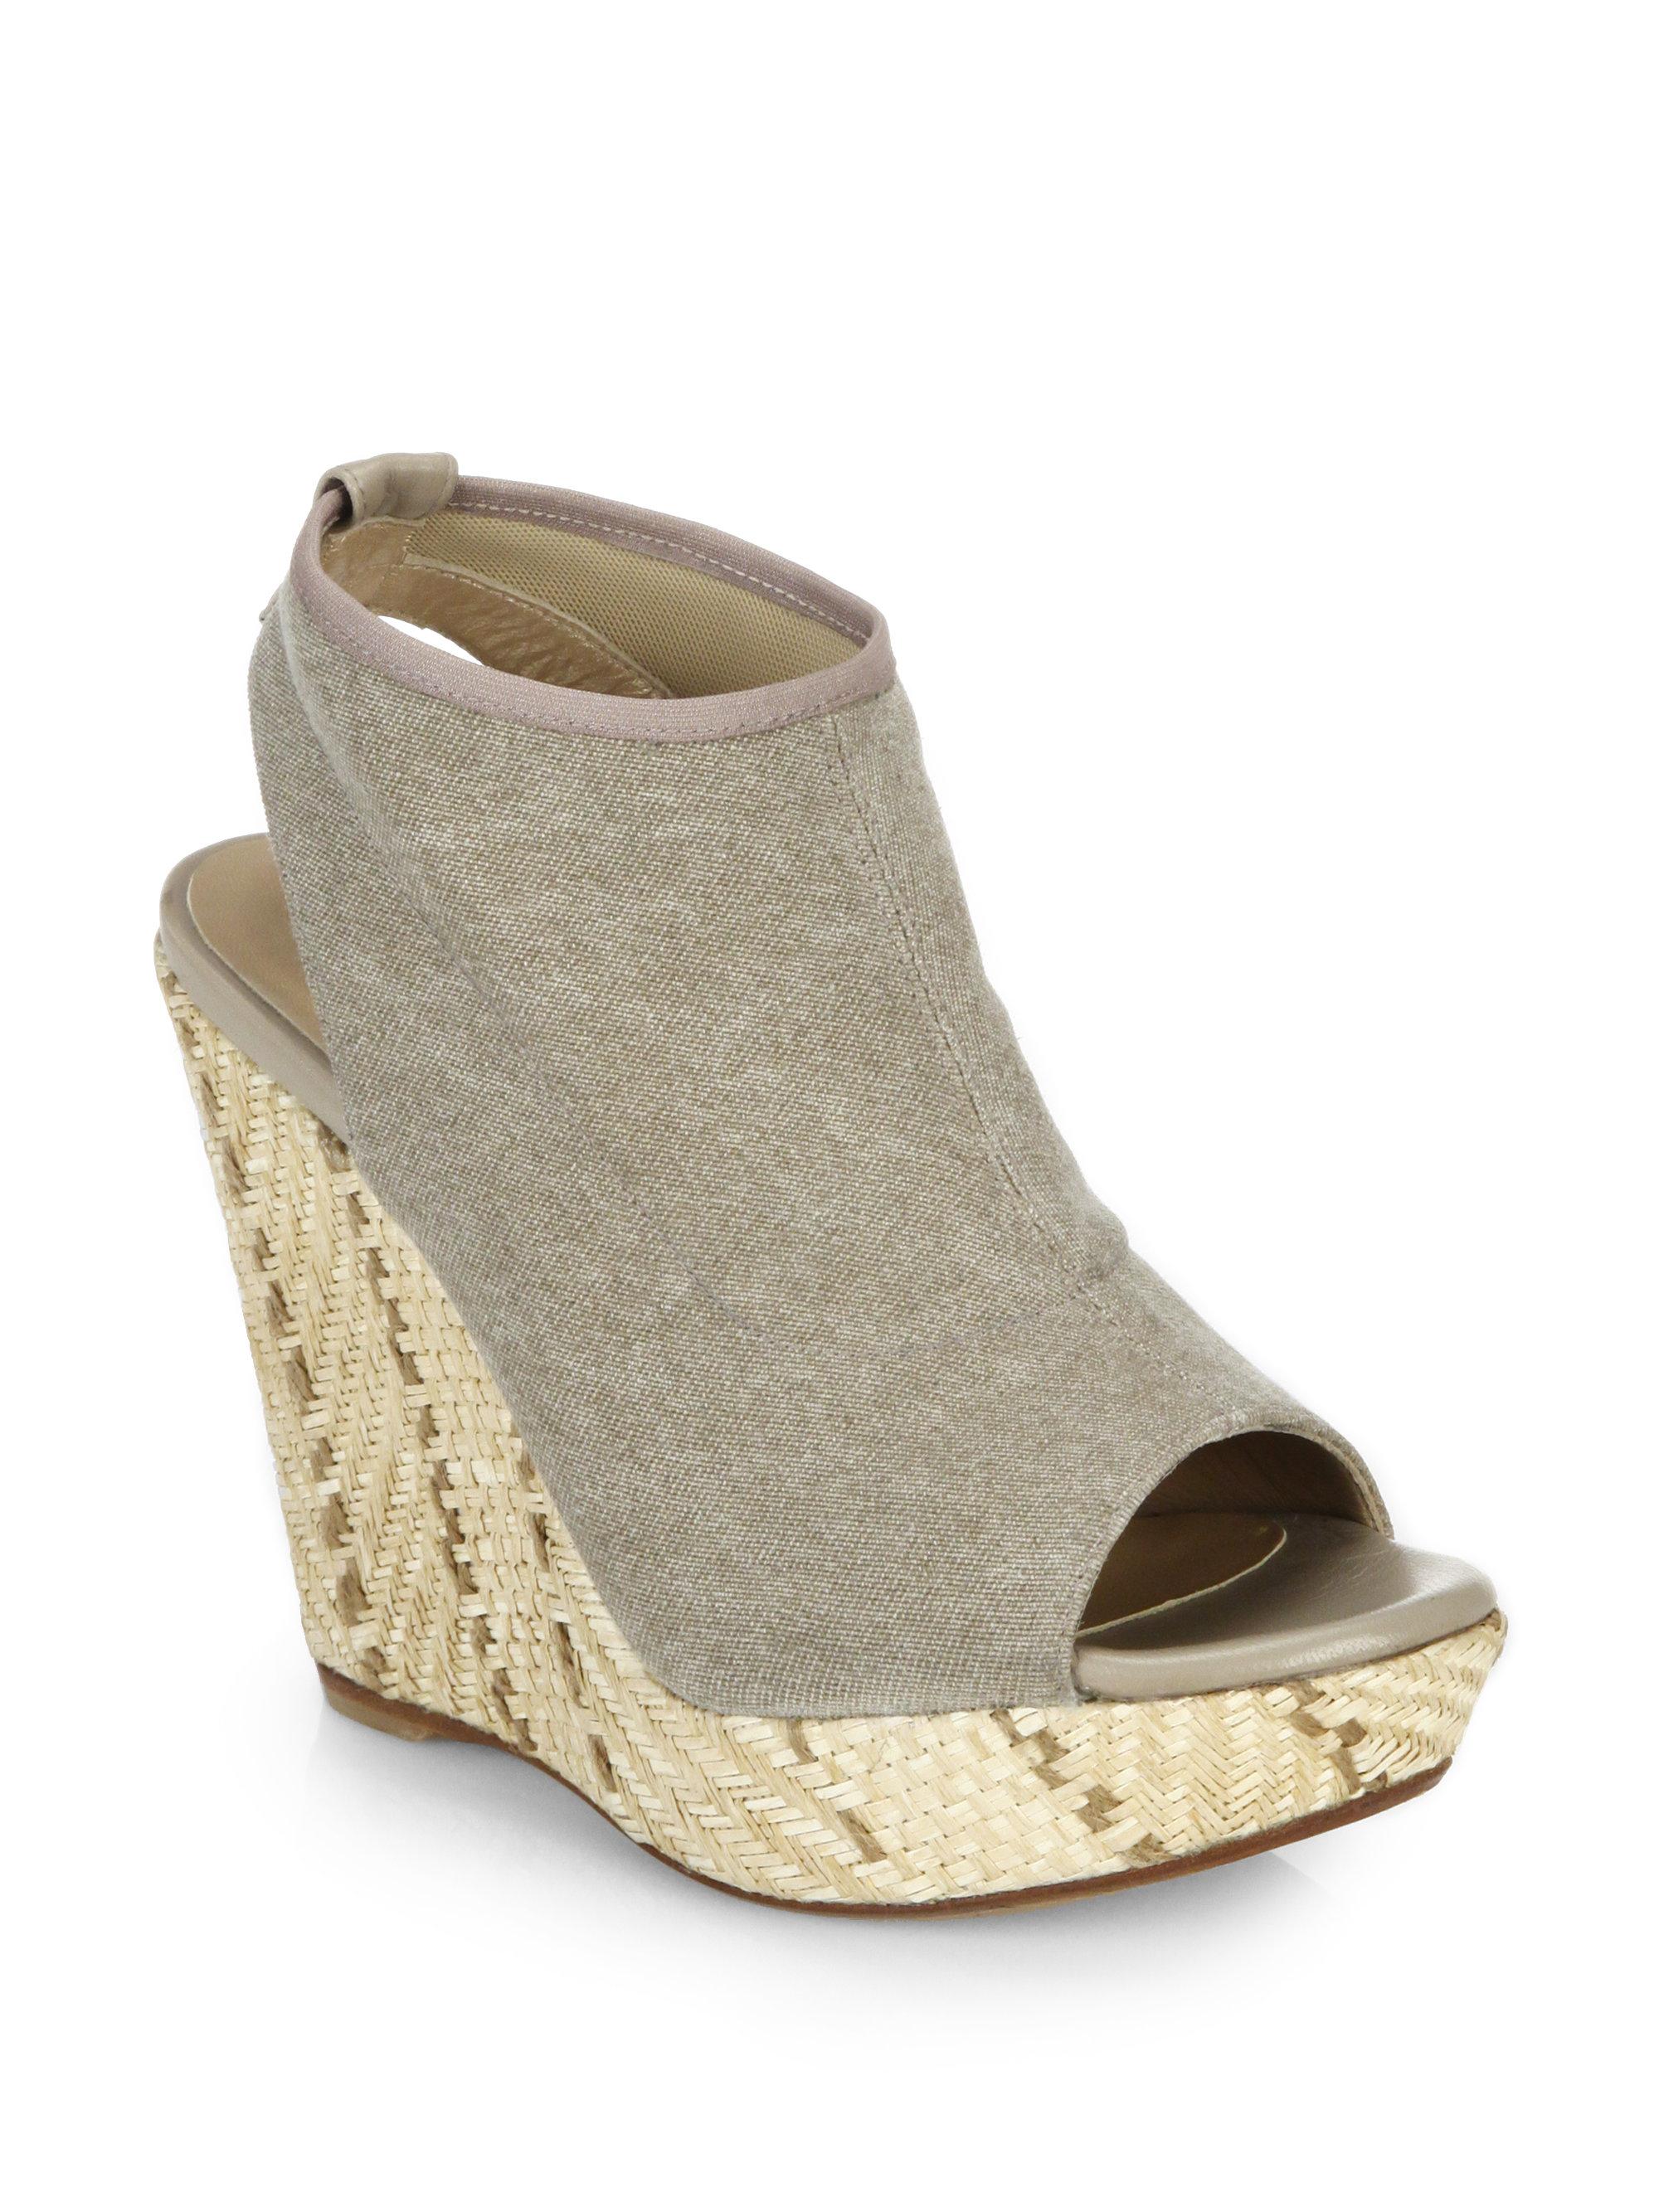 stuart weitzman espadrille wedge sandals in gray lyst